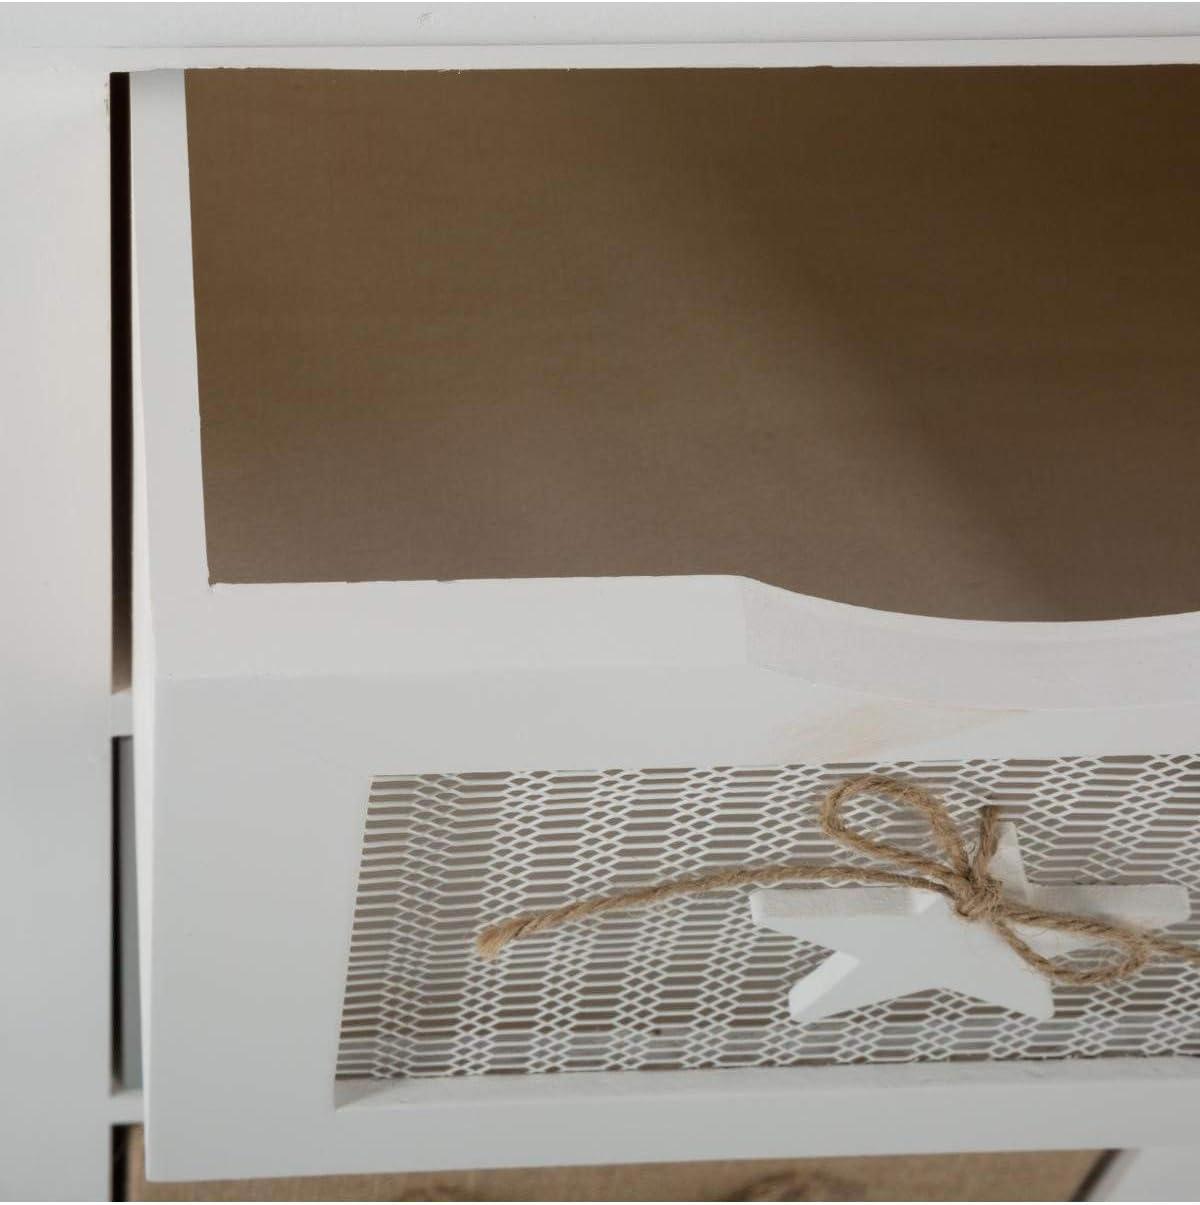 Chiffonnier 4 tiroirs /étoile H 89 cm Atmosphera